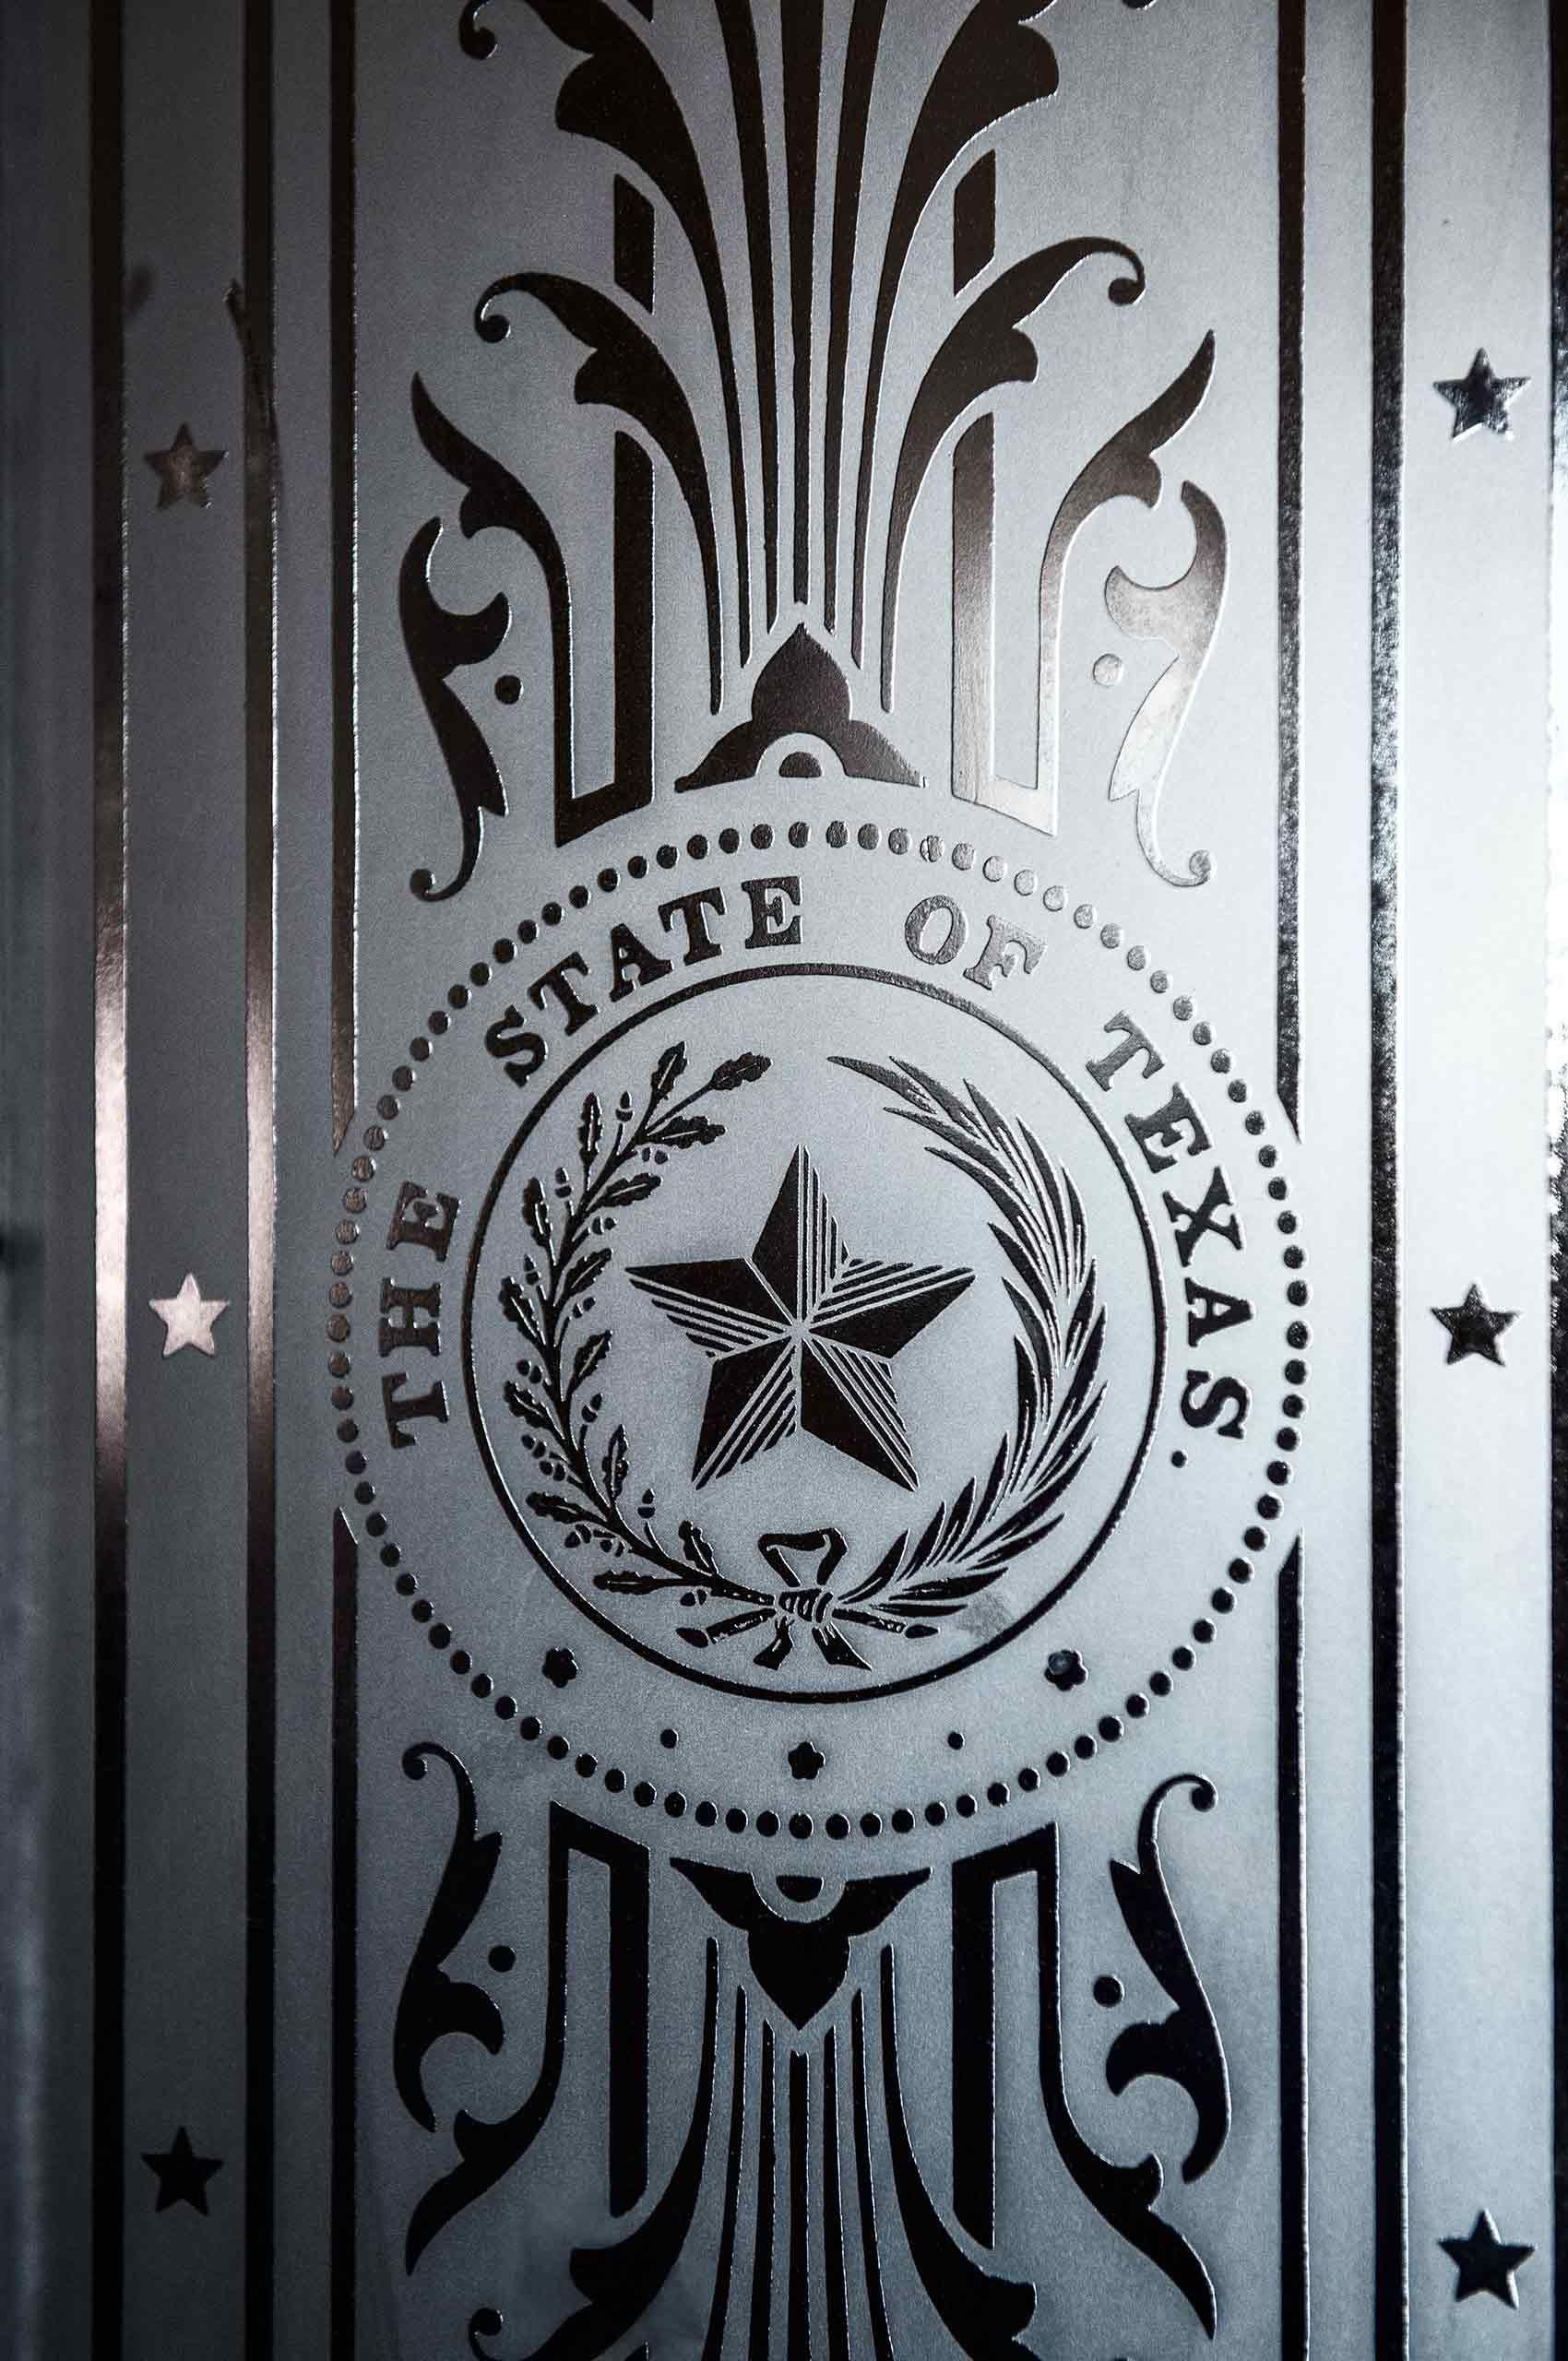 StateOfTexas-Emblem-GlassDoor-Austin-CapitolBuilding-by-HenrikOlundPhotography.jpg